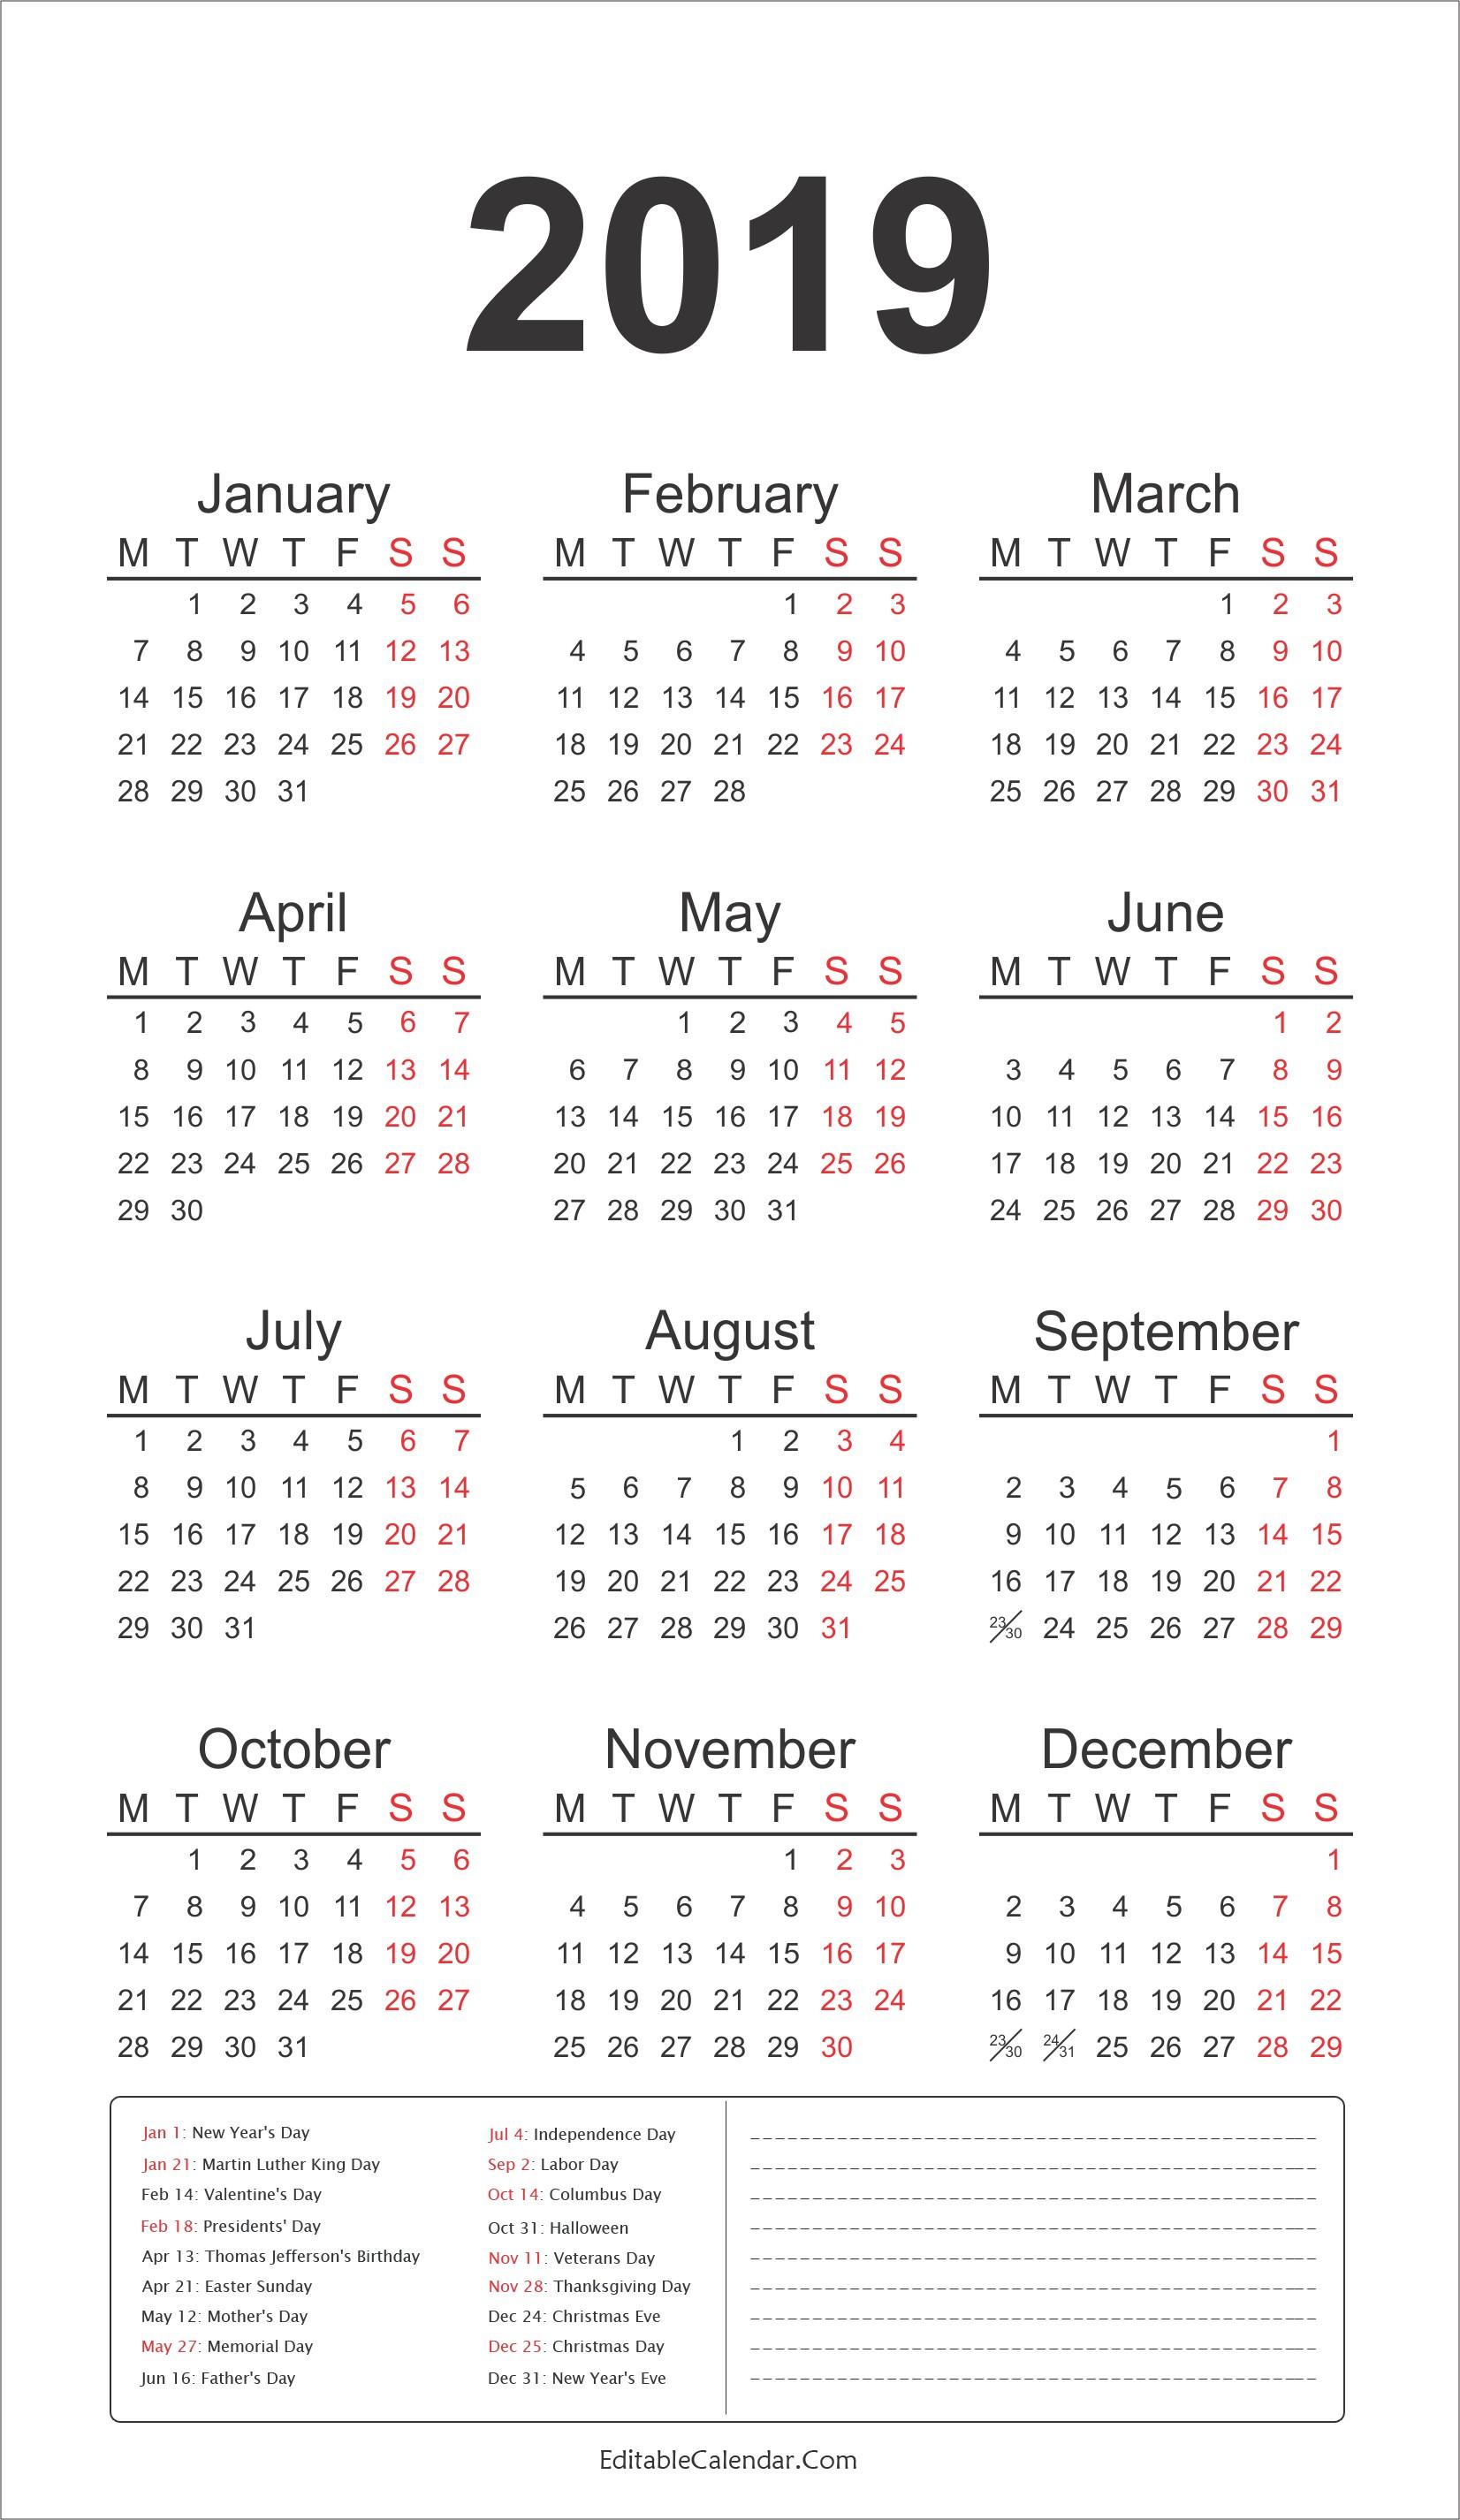 2019 Calendar with Federal Holidays Printable